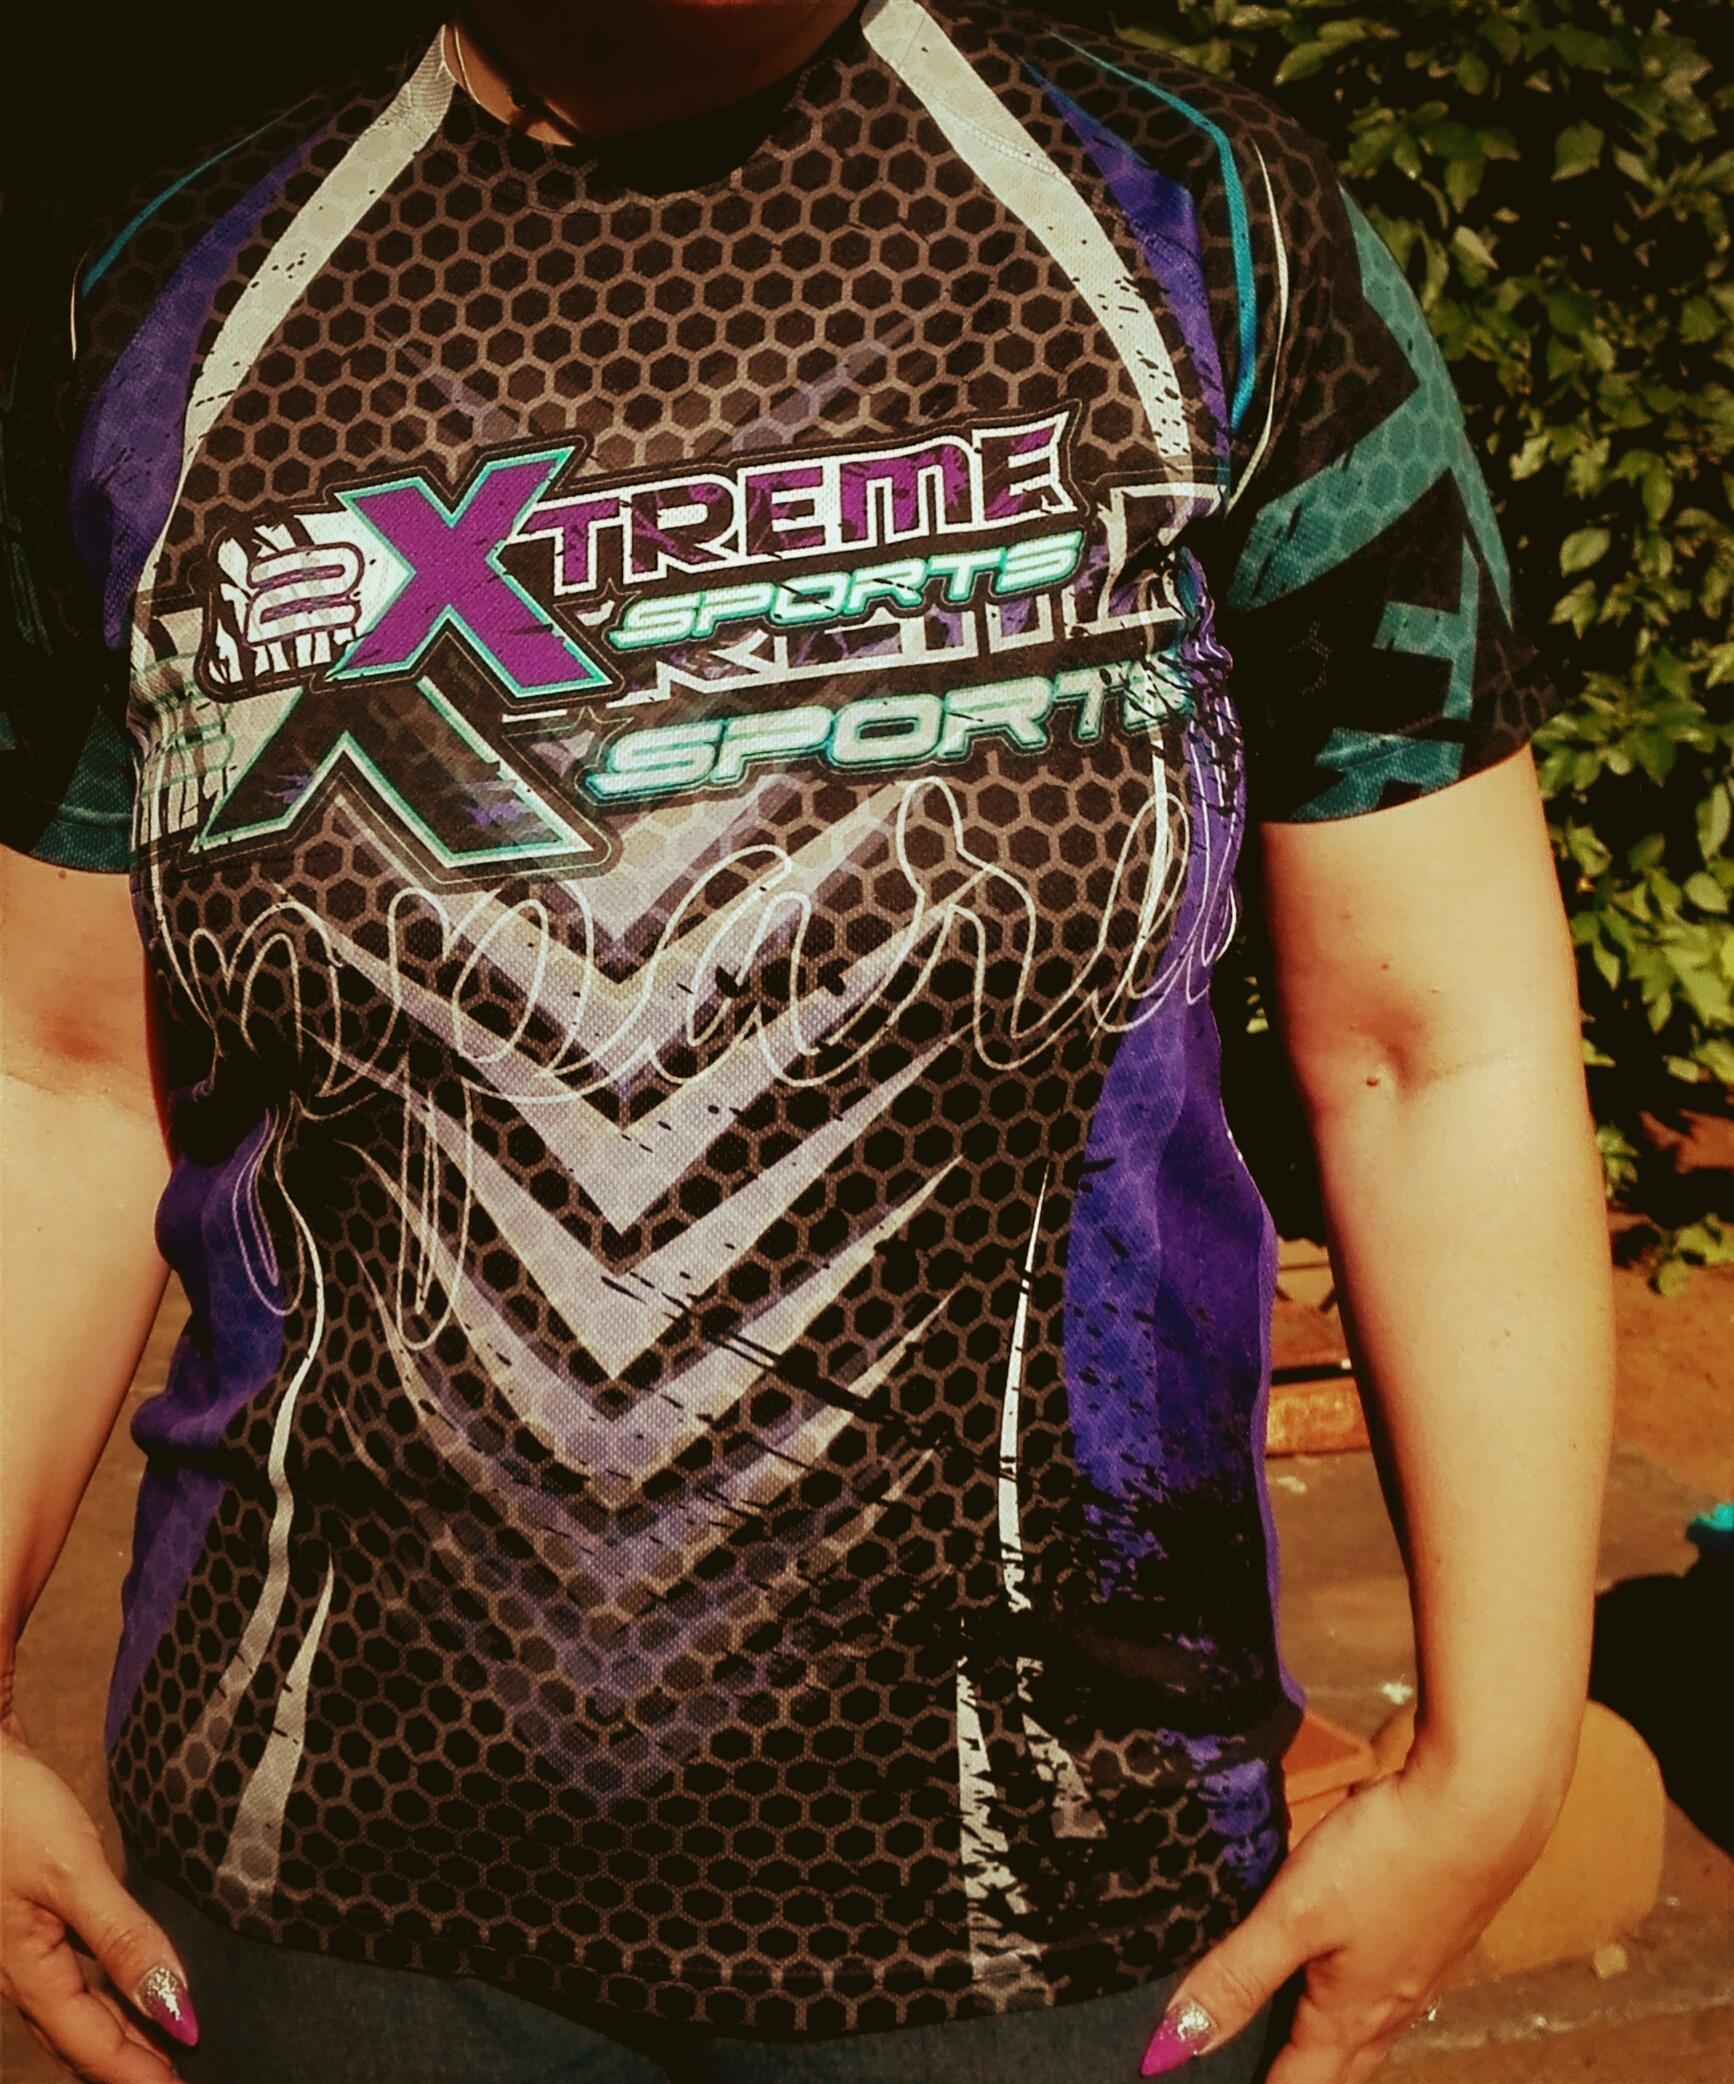 2XtremeSports T-shirt